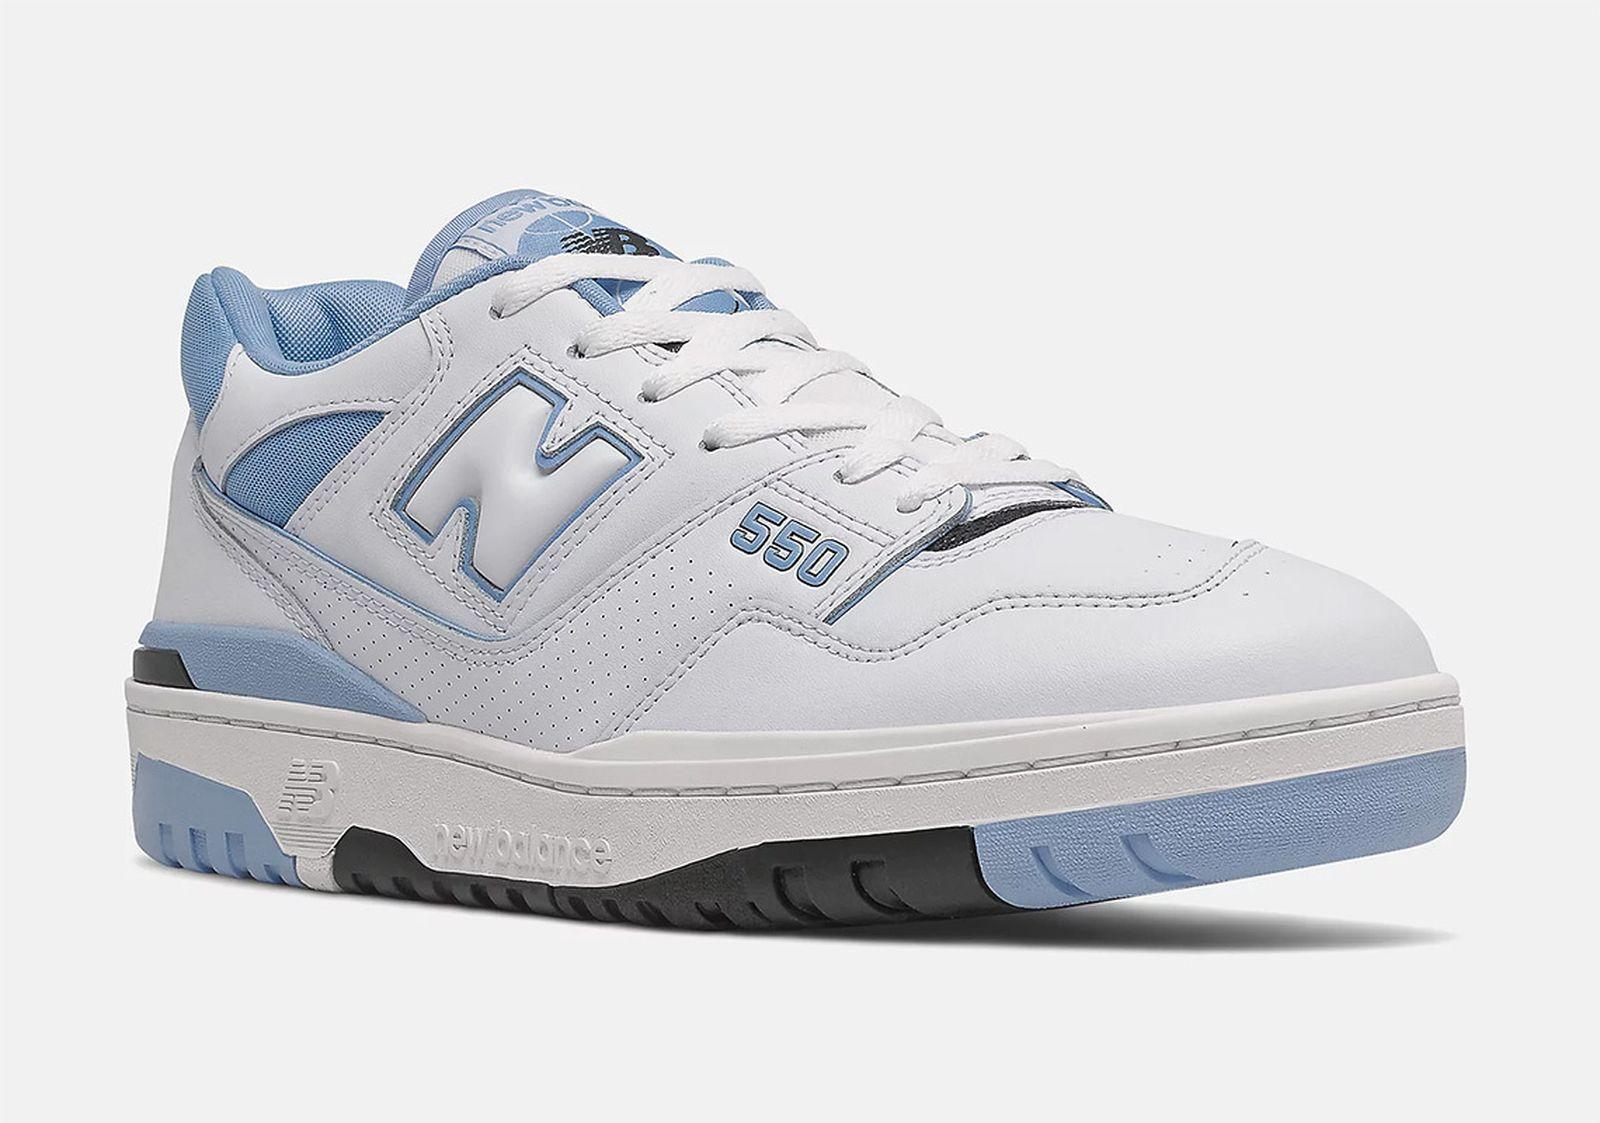 new-balance-550-light-blue-release-date-price-03